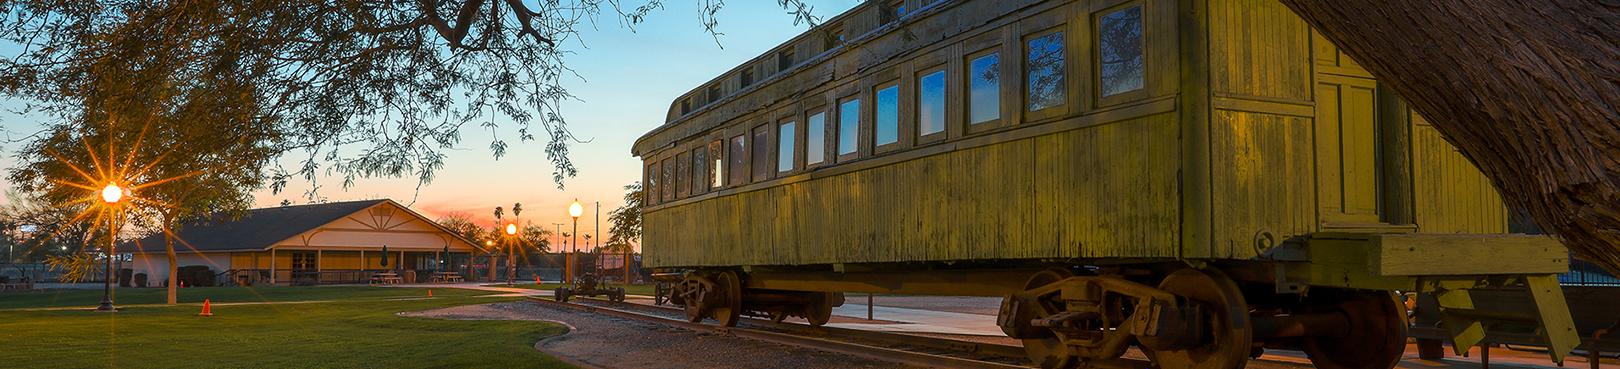 Colorado River State Historic Park